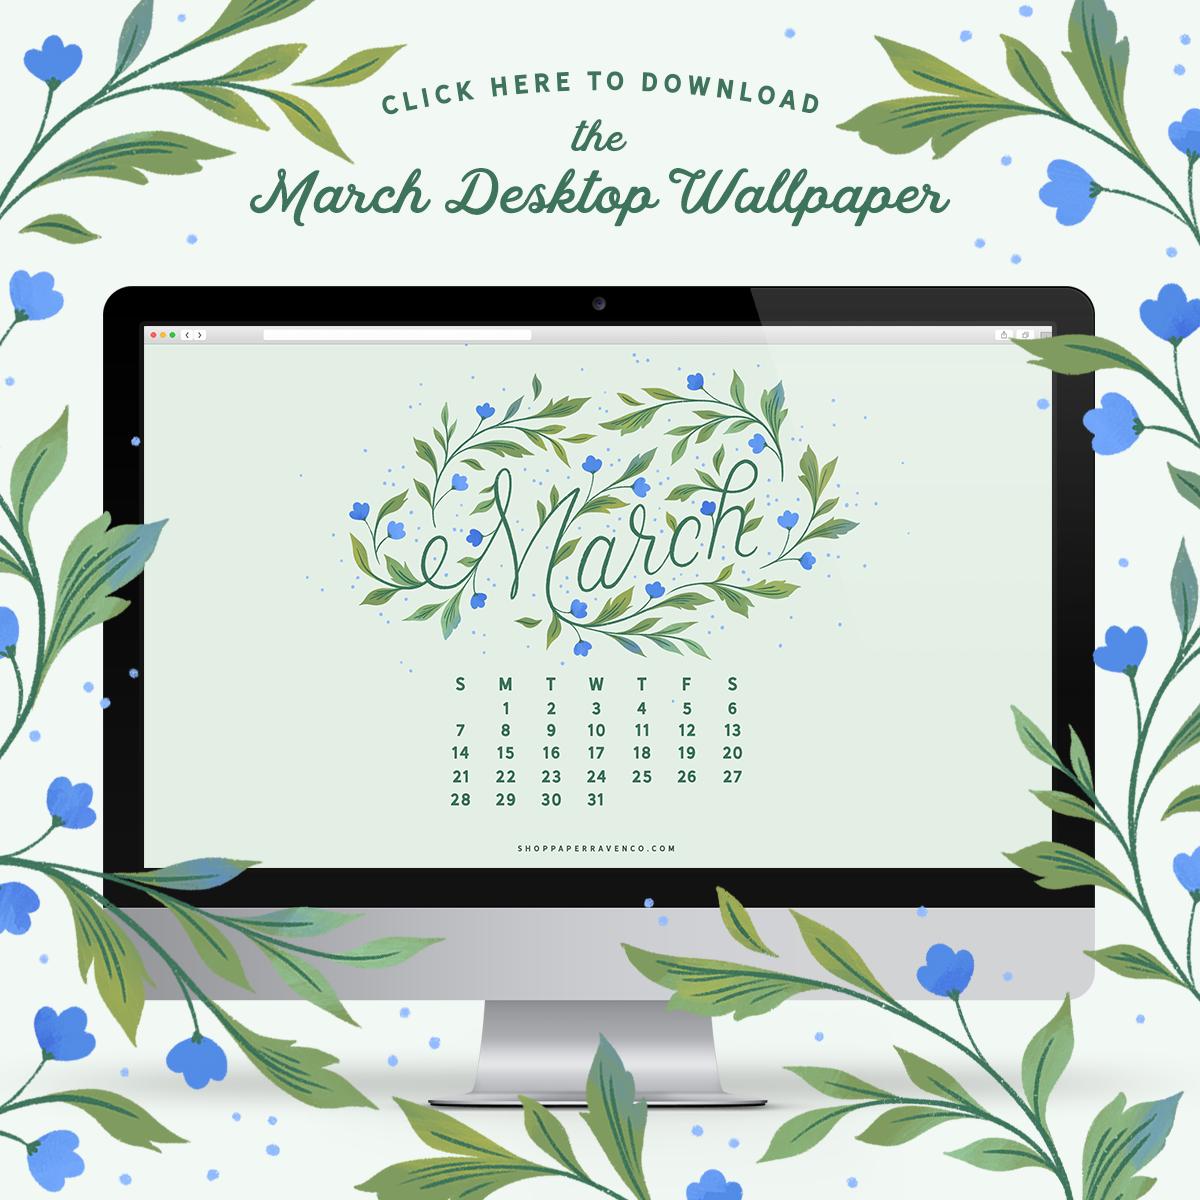 March 2021 Illustrated Desktop Wallpaper by Paper Raven Co. #dressyourtech #desktopwallpaper #desktopdownload